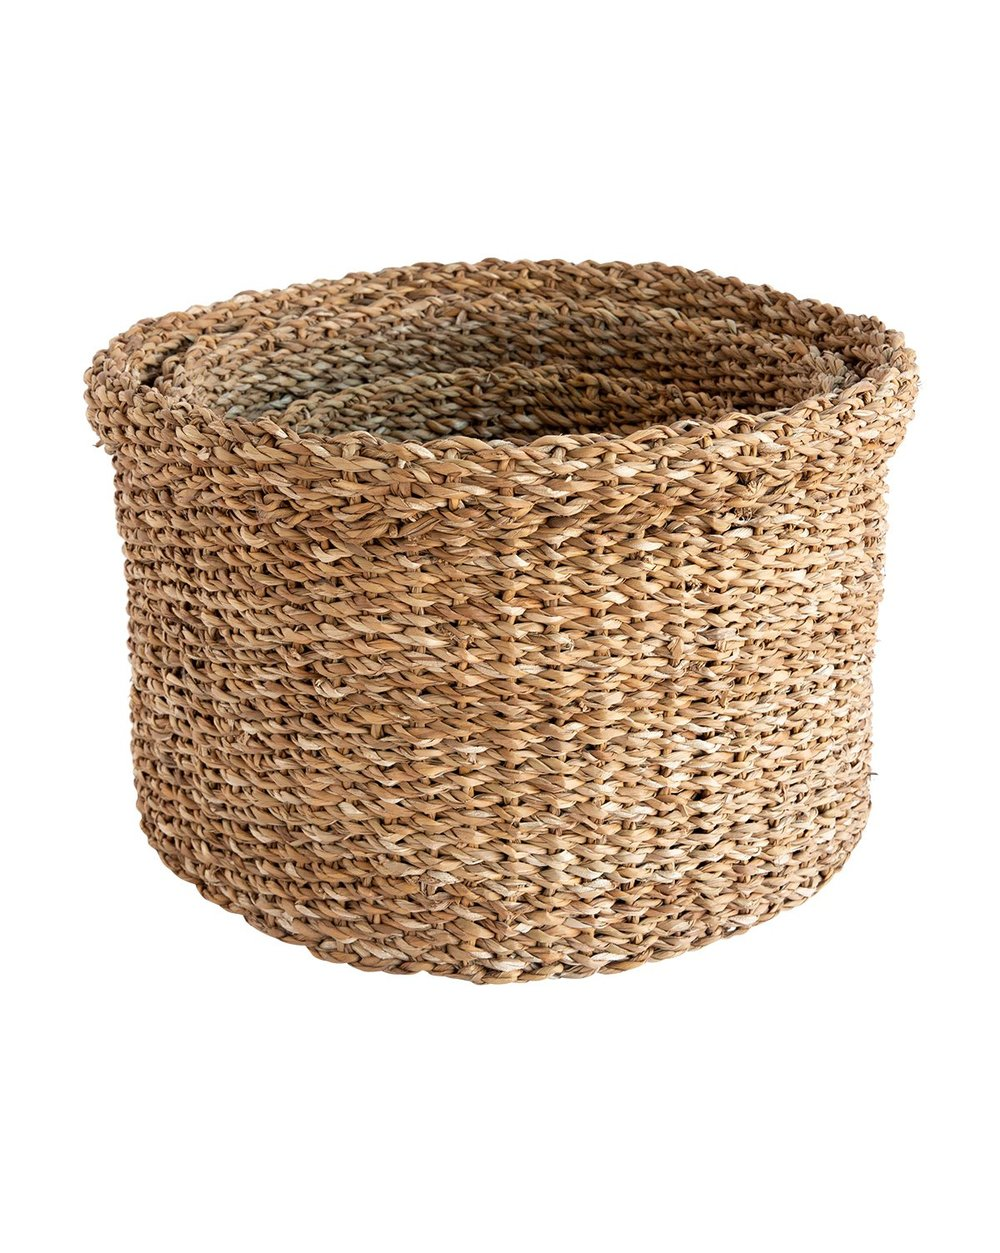 Cuffed_Seagrass_Baskets_1.jpg